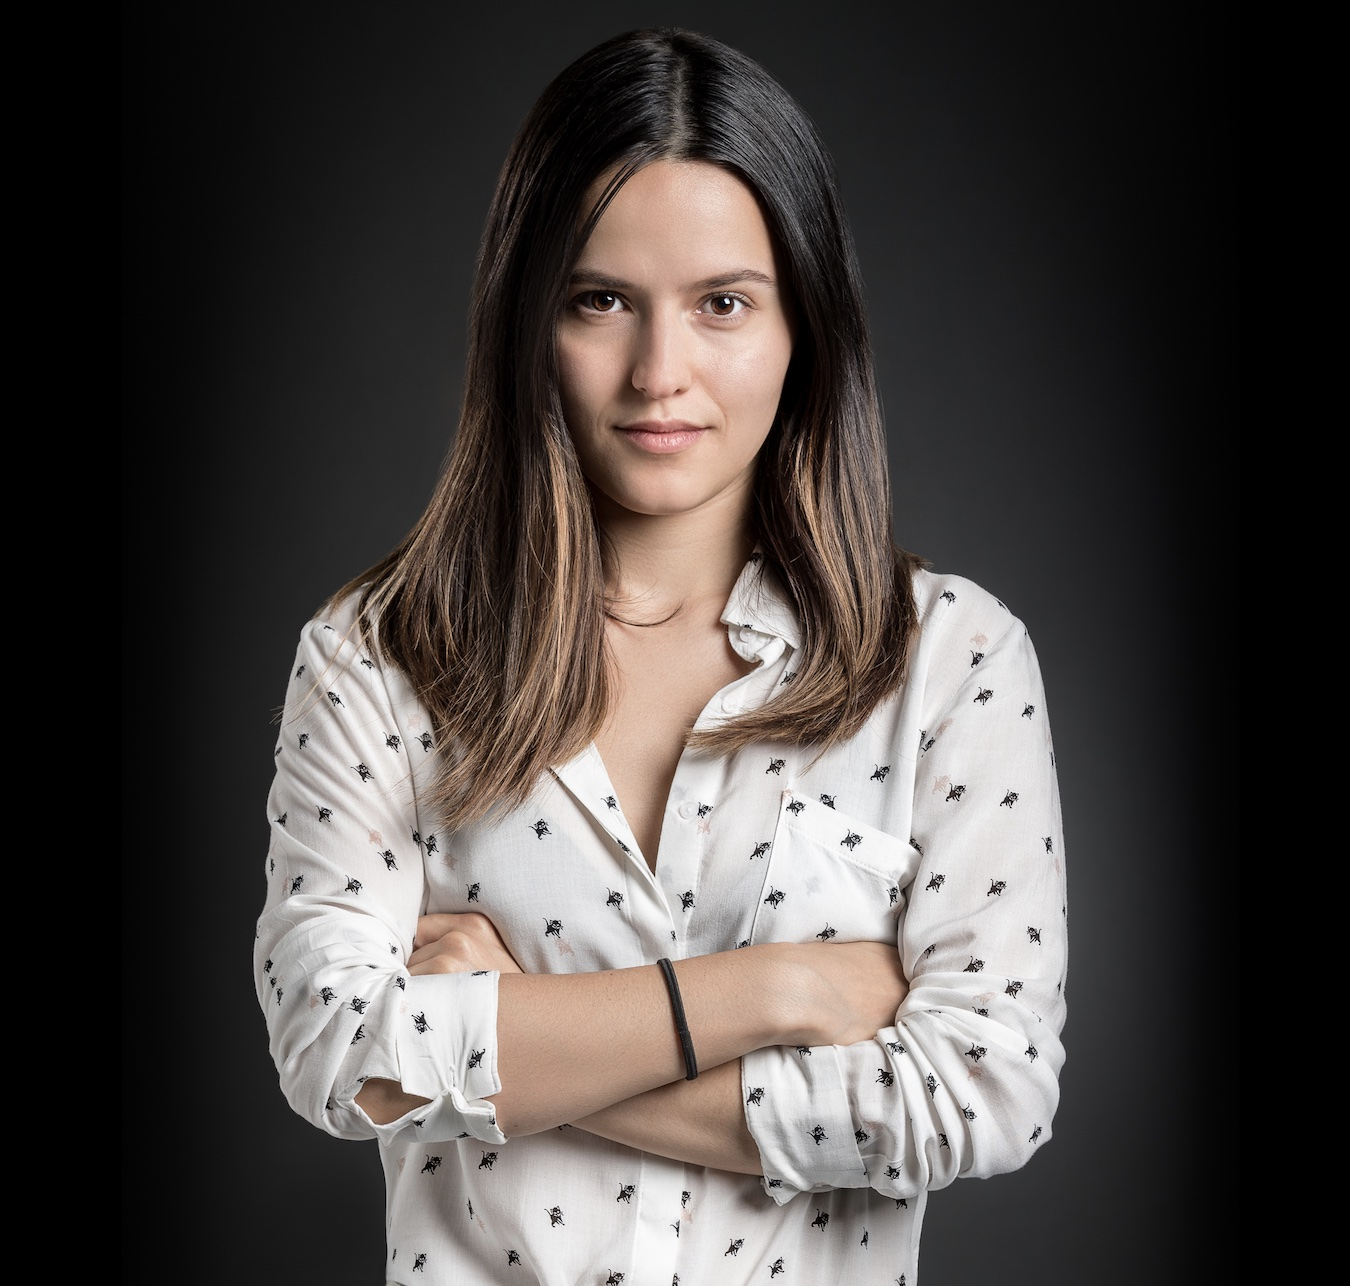 Alicia Jaziz